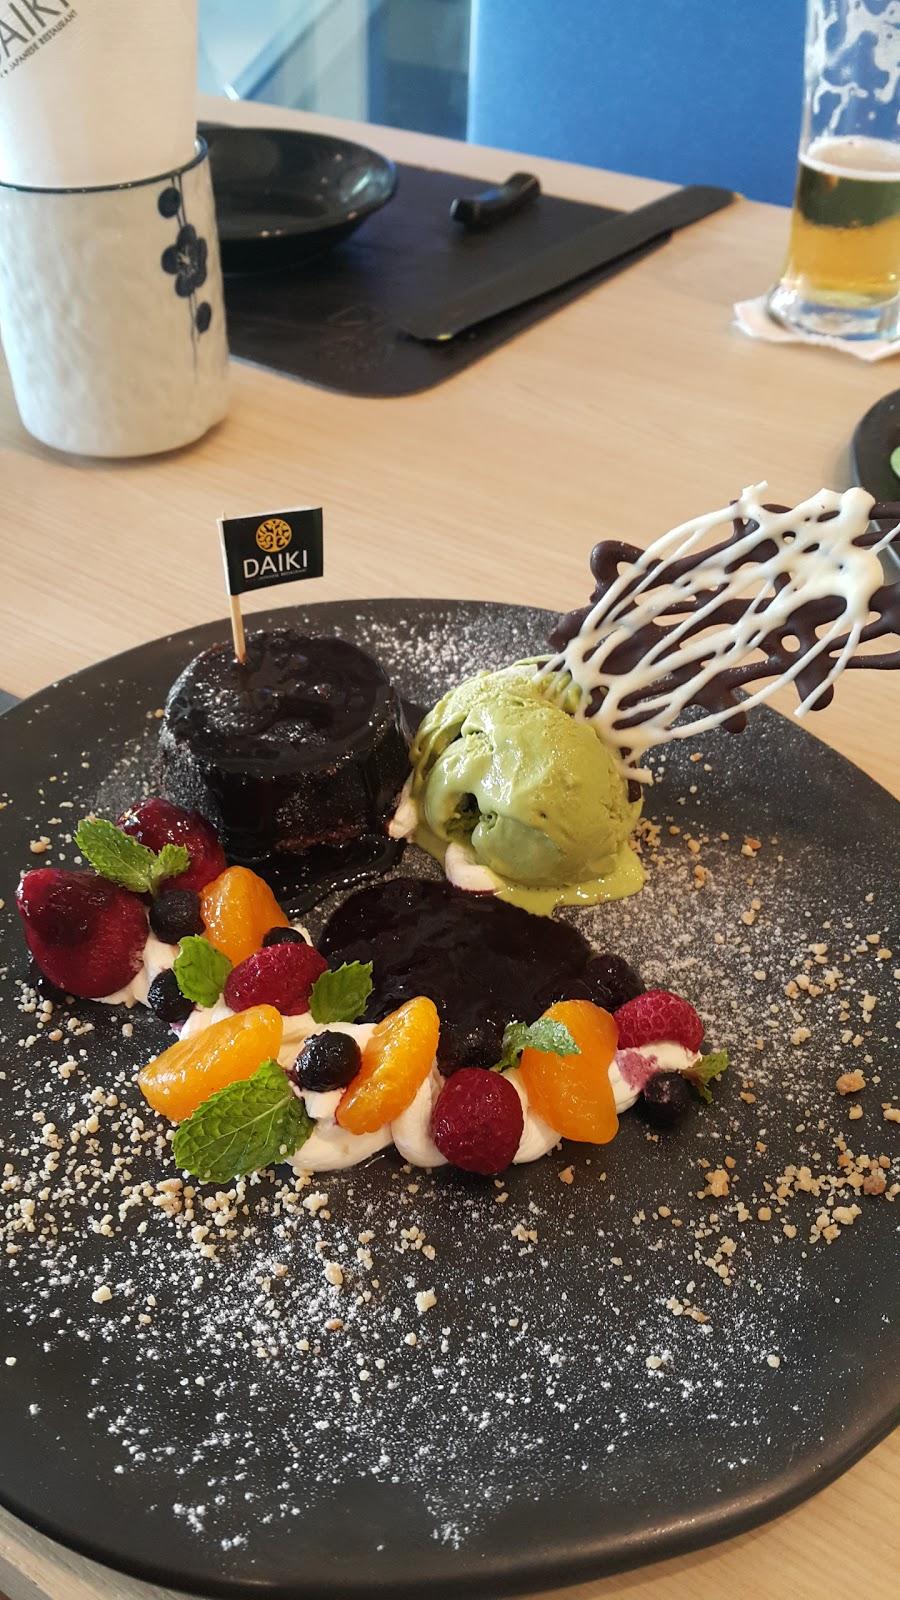 Daiki Japanese Restaurant | restaurant | 99 Frank St, Labrador QLD 4215, Australia | 0755282133 OR +61 7 5528 2133